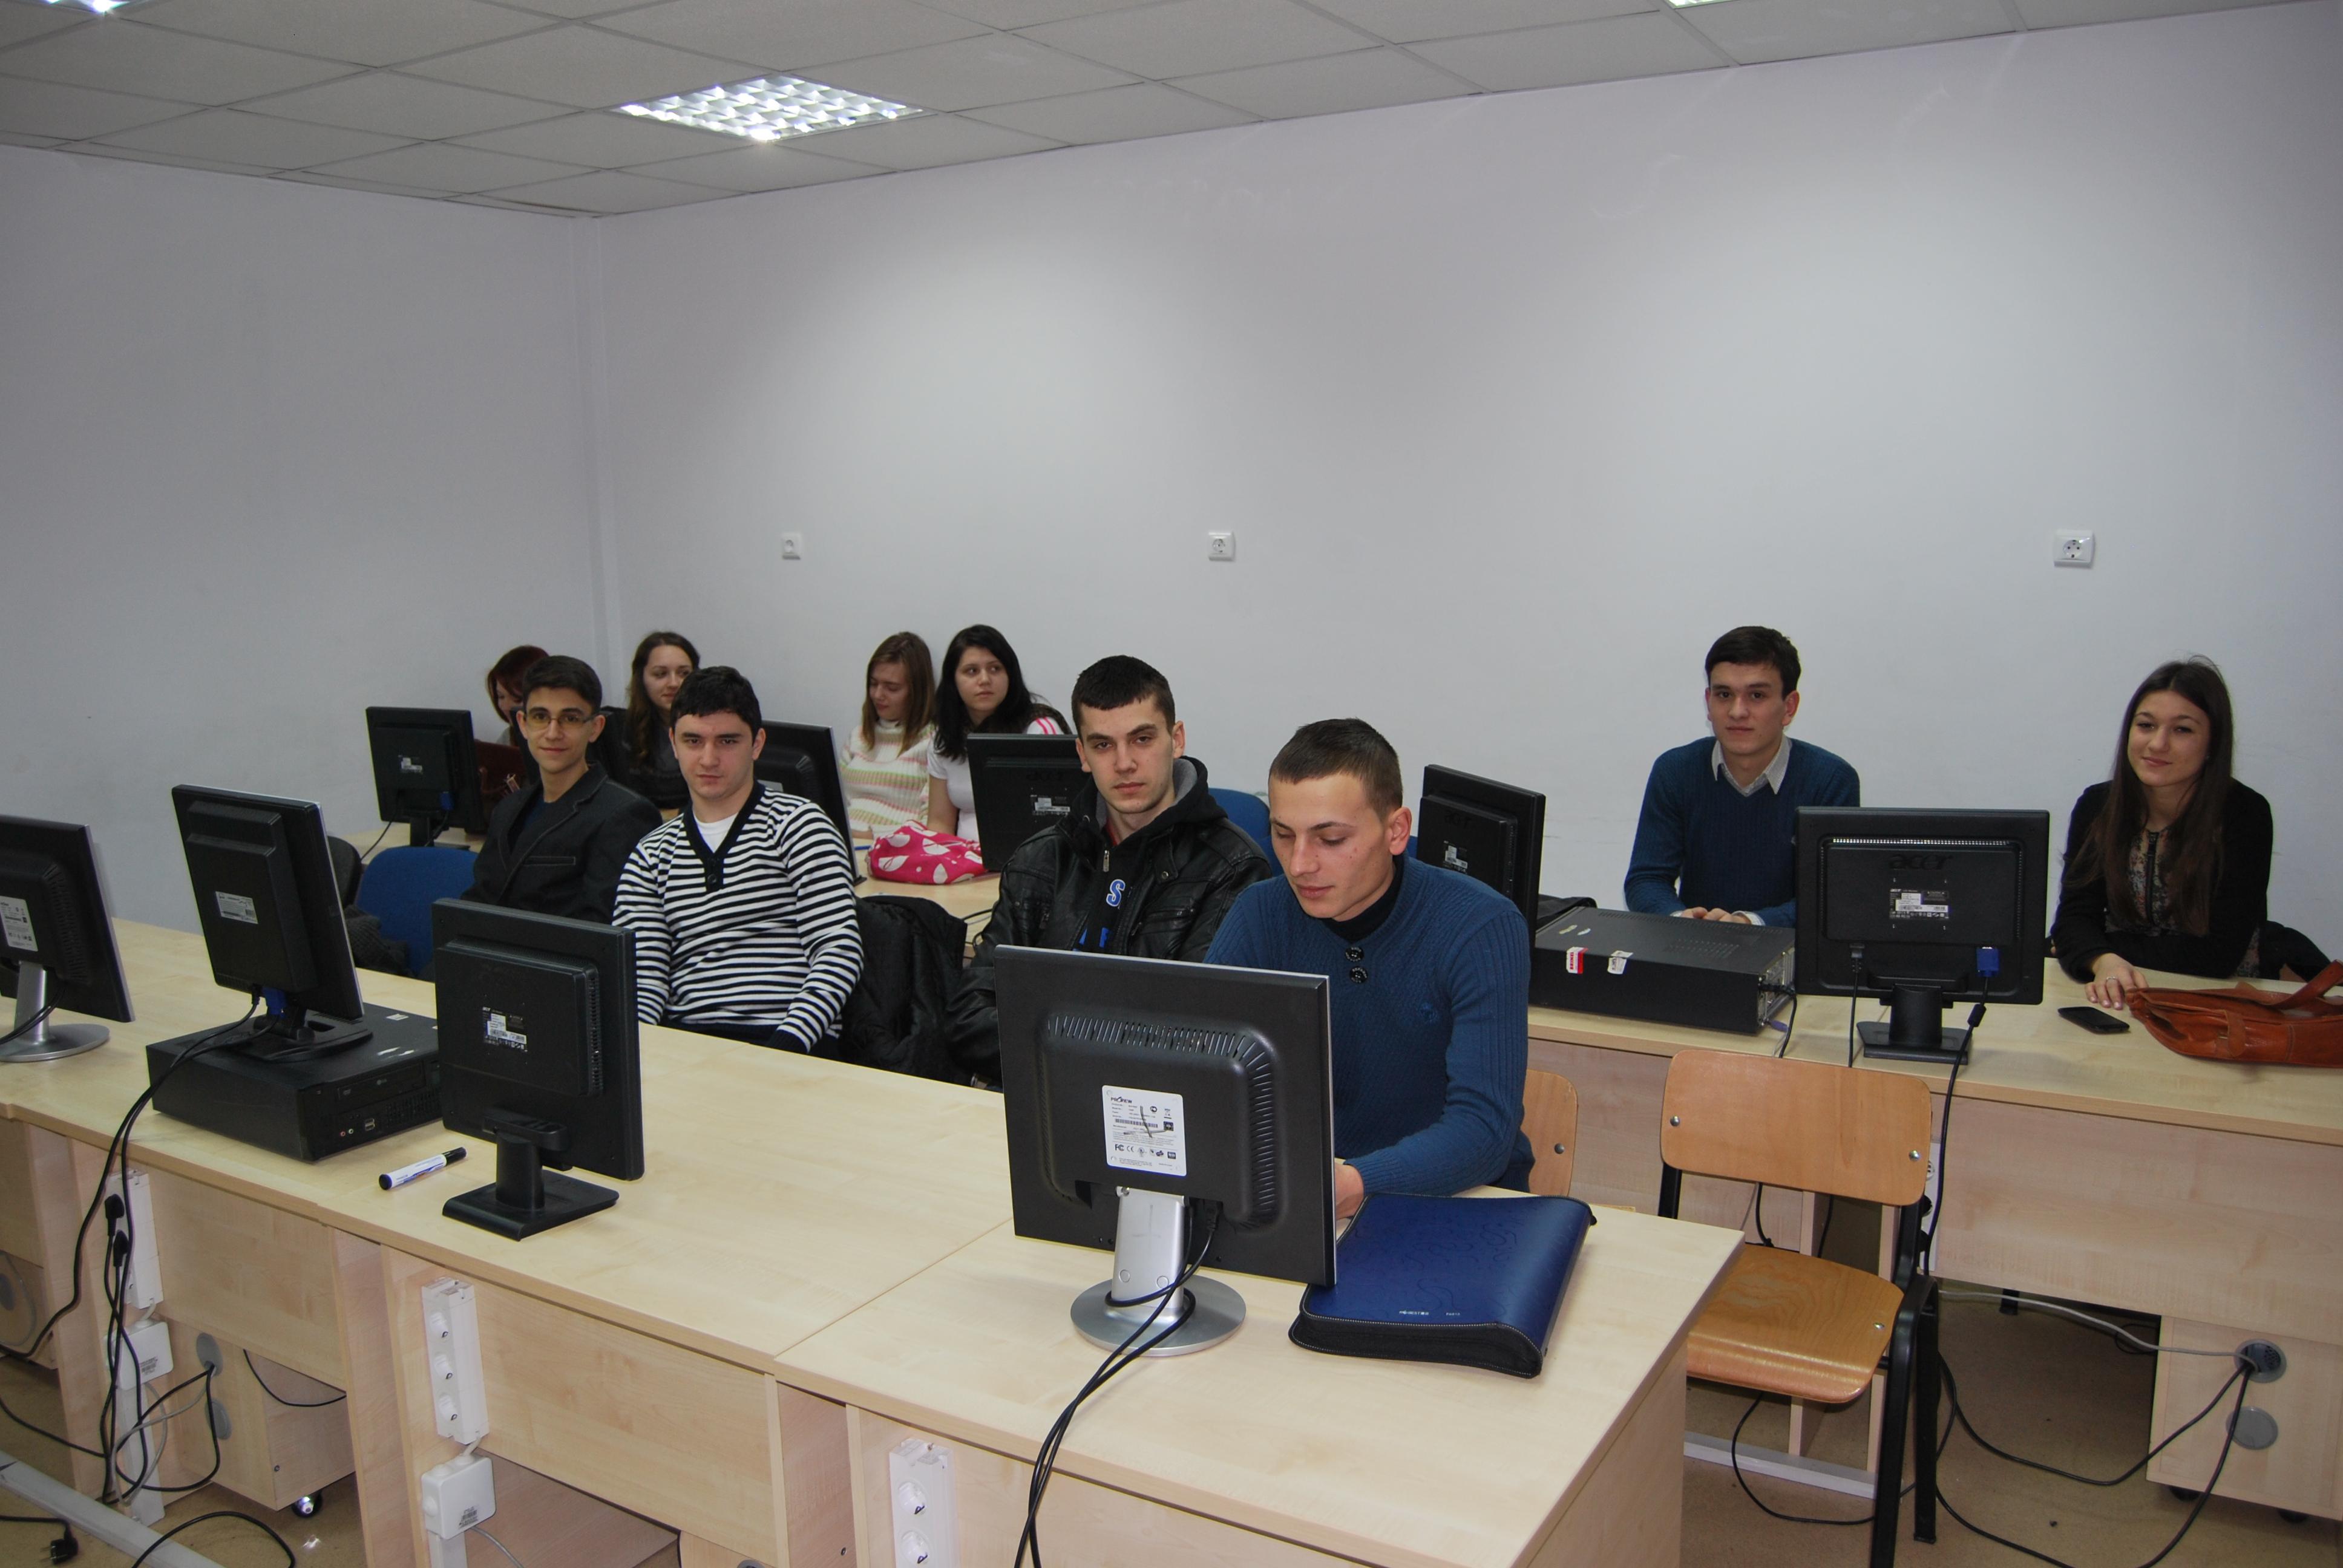 ED 004 laborator de stiinte sociale si politice